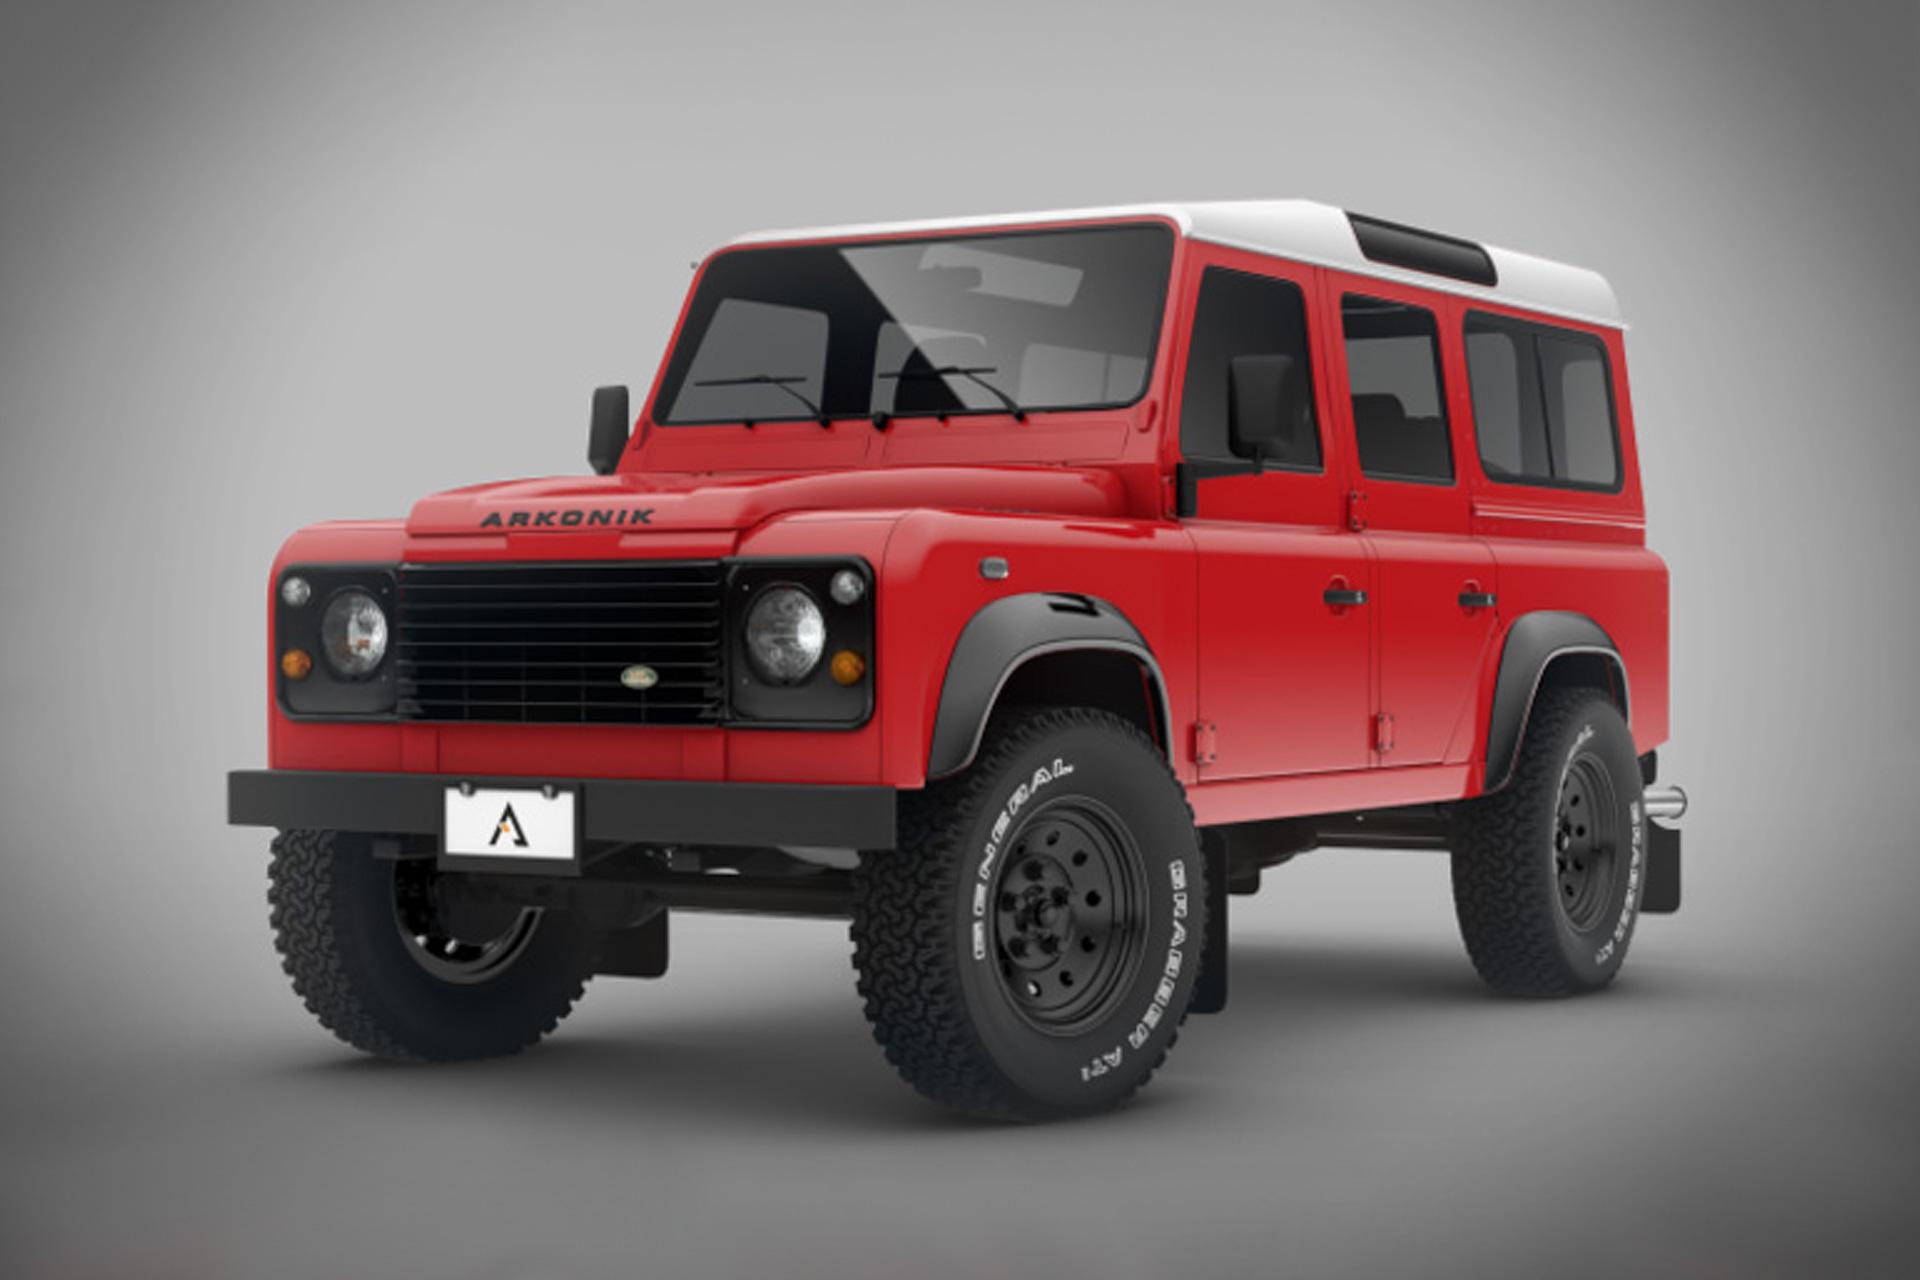 Arkonik Origins Land Rover Defender